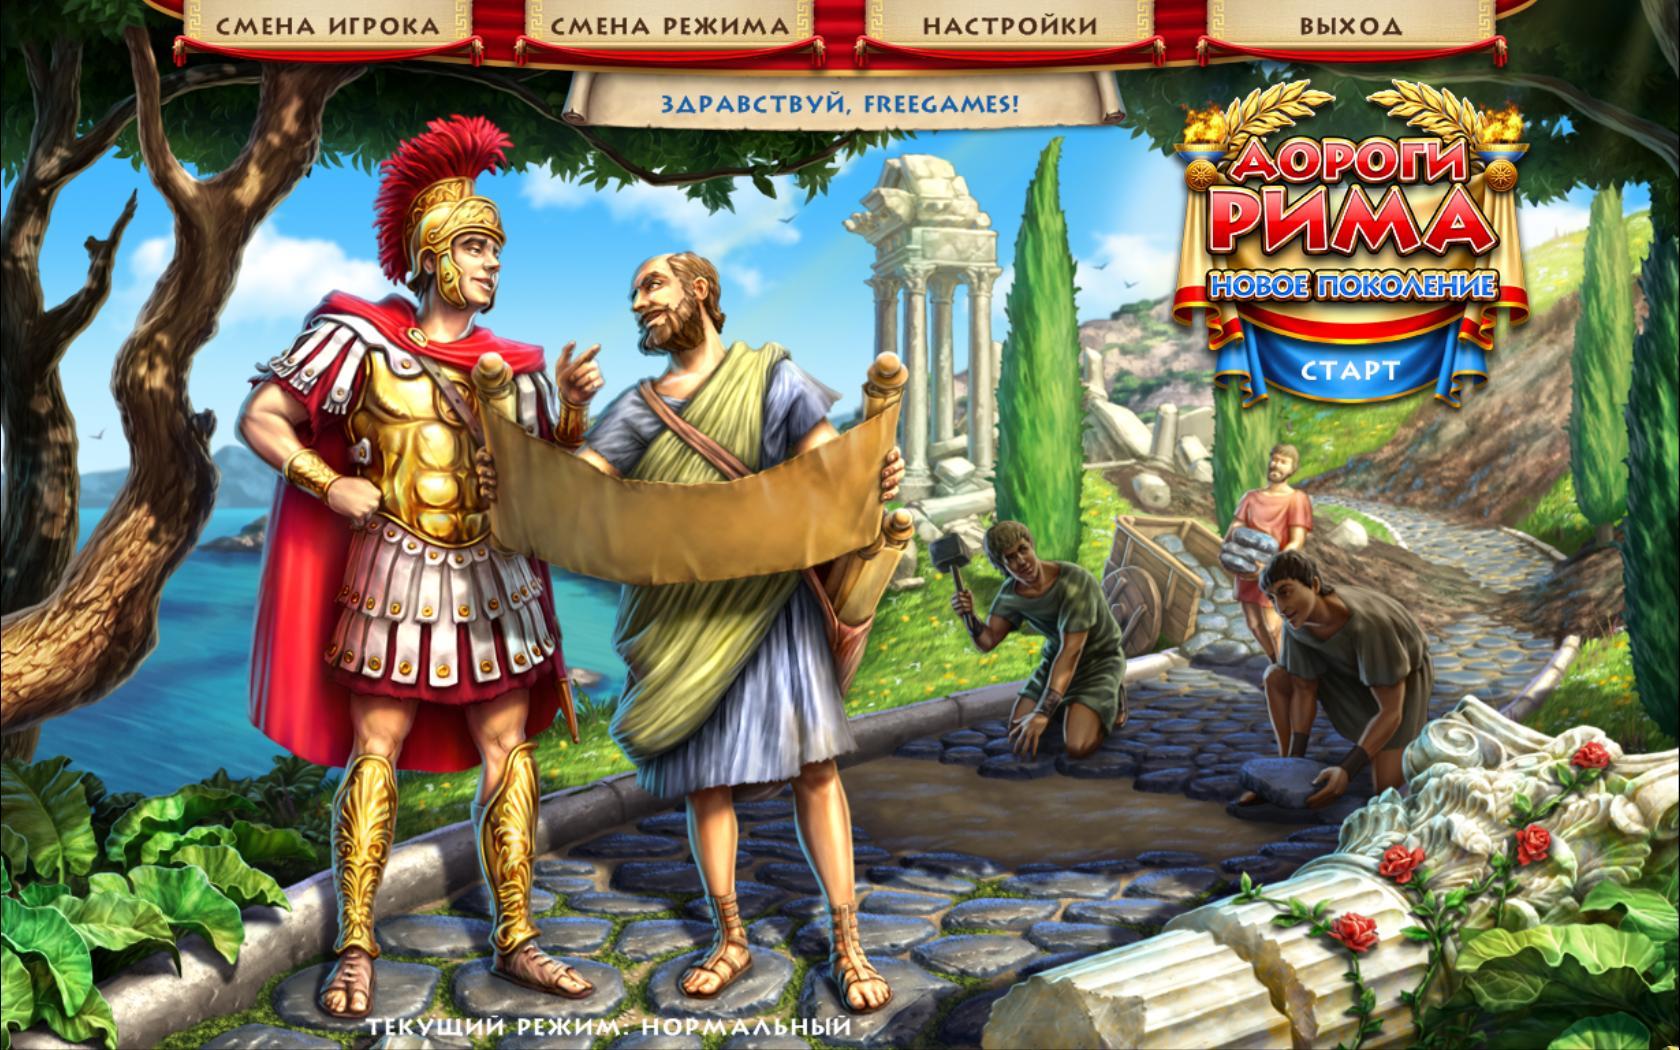 Дороги Рима: Новое поколение | Roads of Rome: New Generation (Rus)